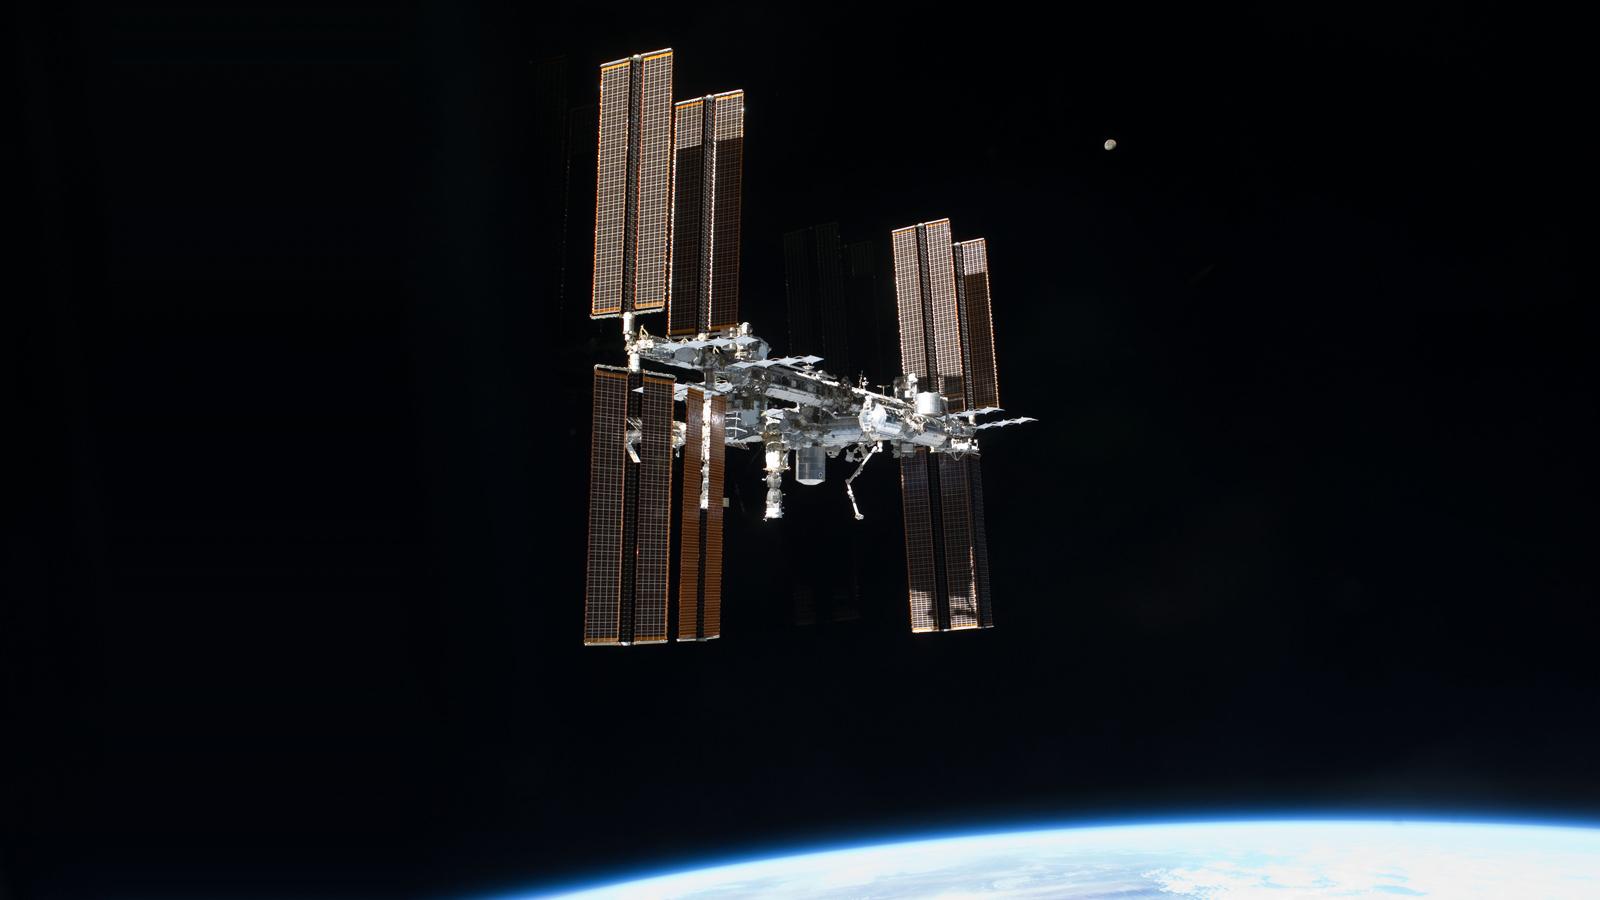 2017 international space station - photo #1